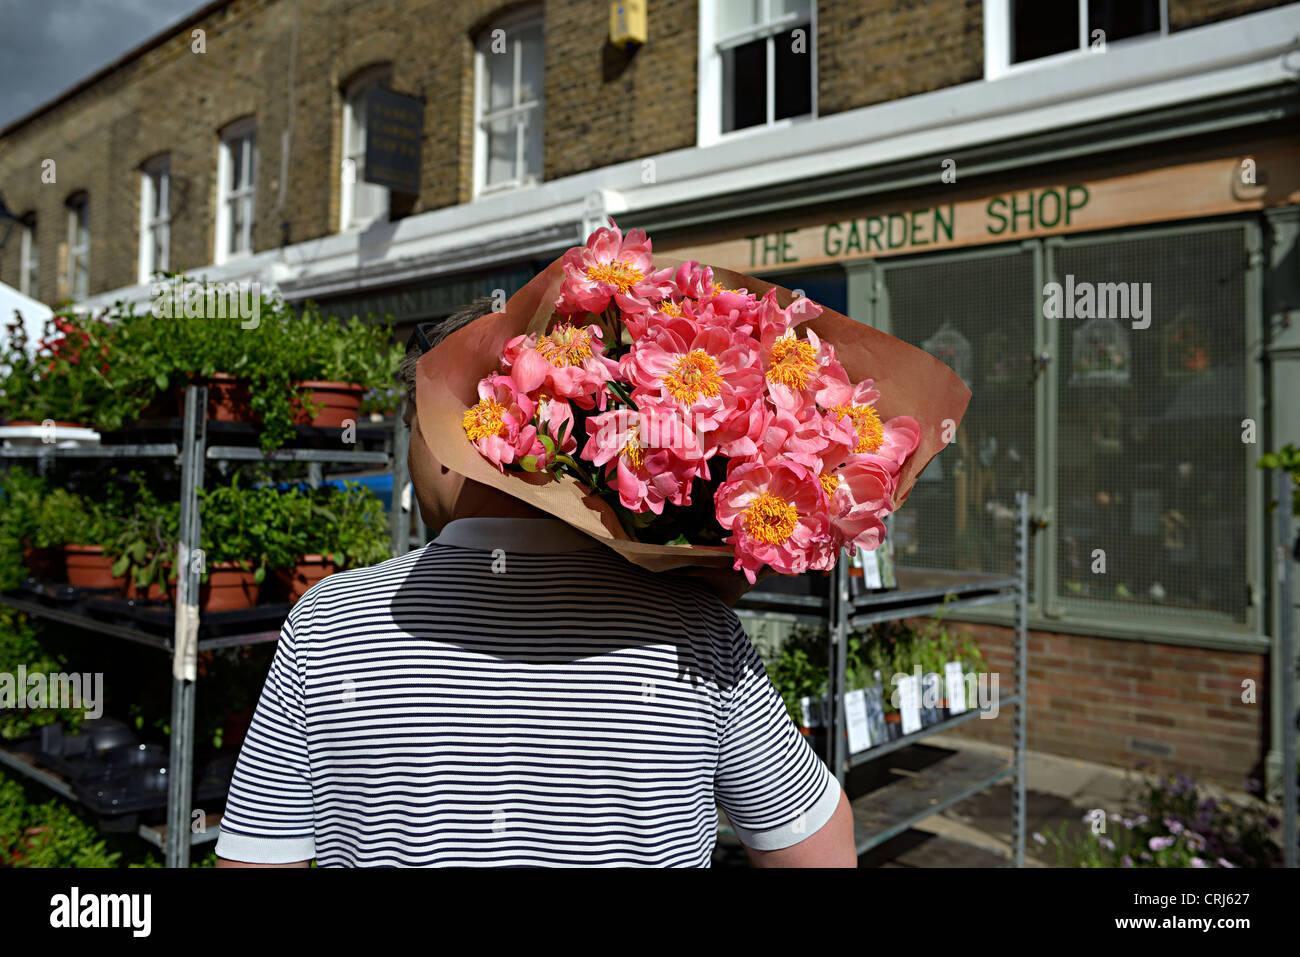 columbia road flower market london - Stock Image